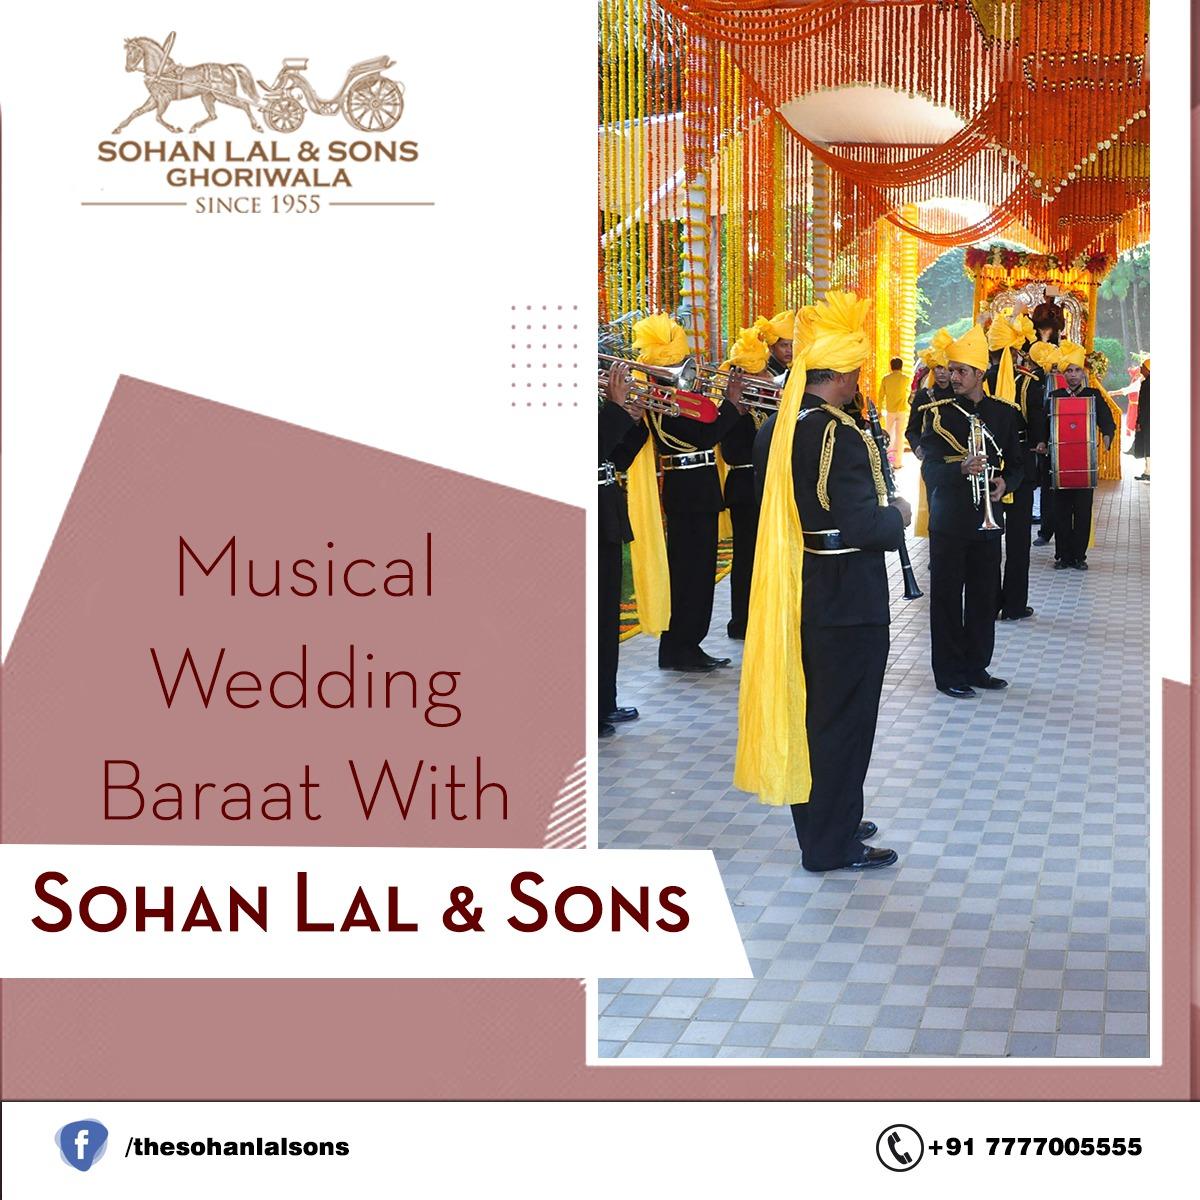 "Enjoy the Musical Wedding Baraat with ""SohanLal & Sons""  . . #SohanLalAndSons #SohanLal #Band #Ghodi #Wedding #BestBhangda"